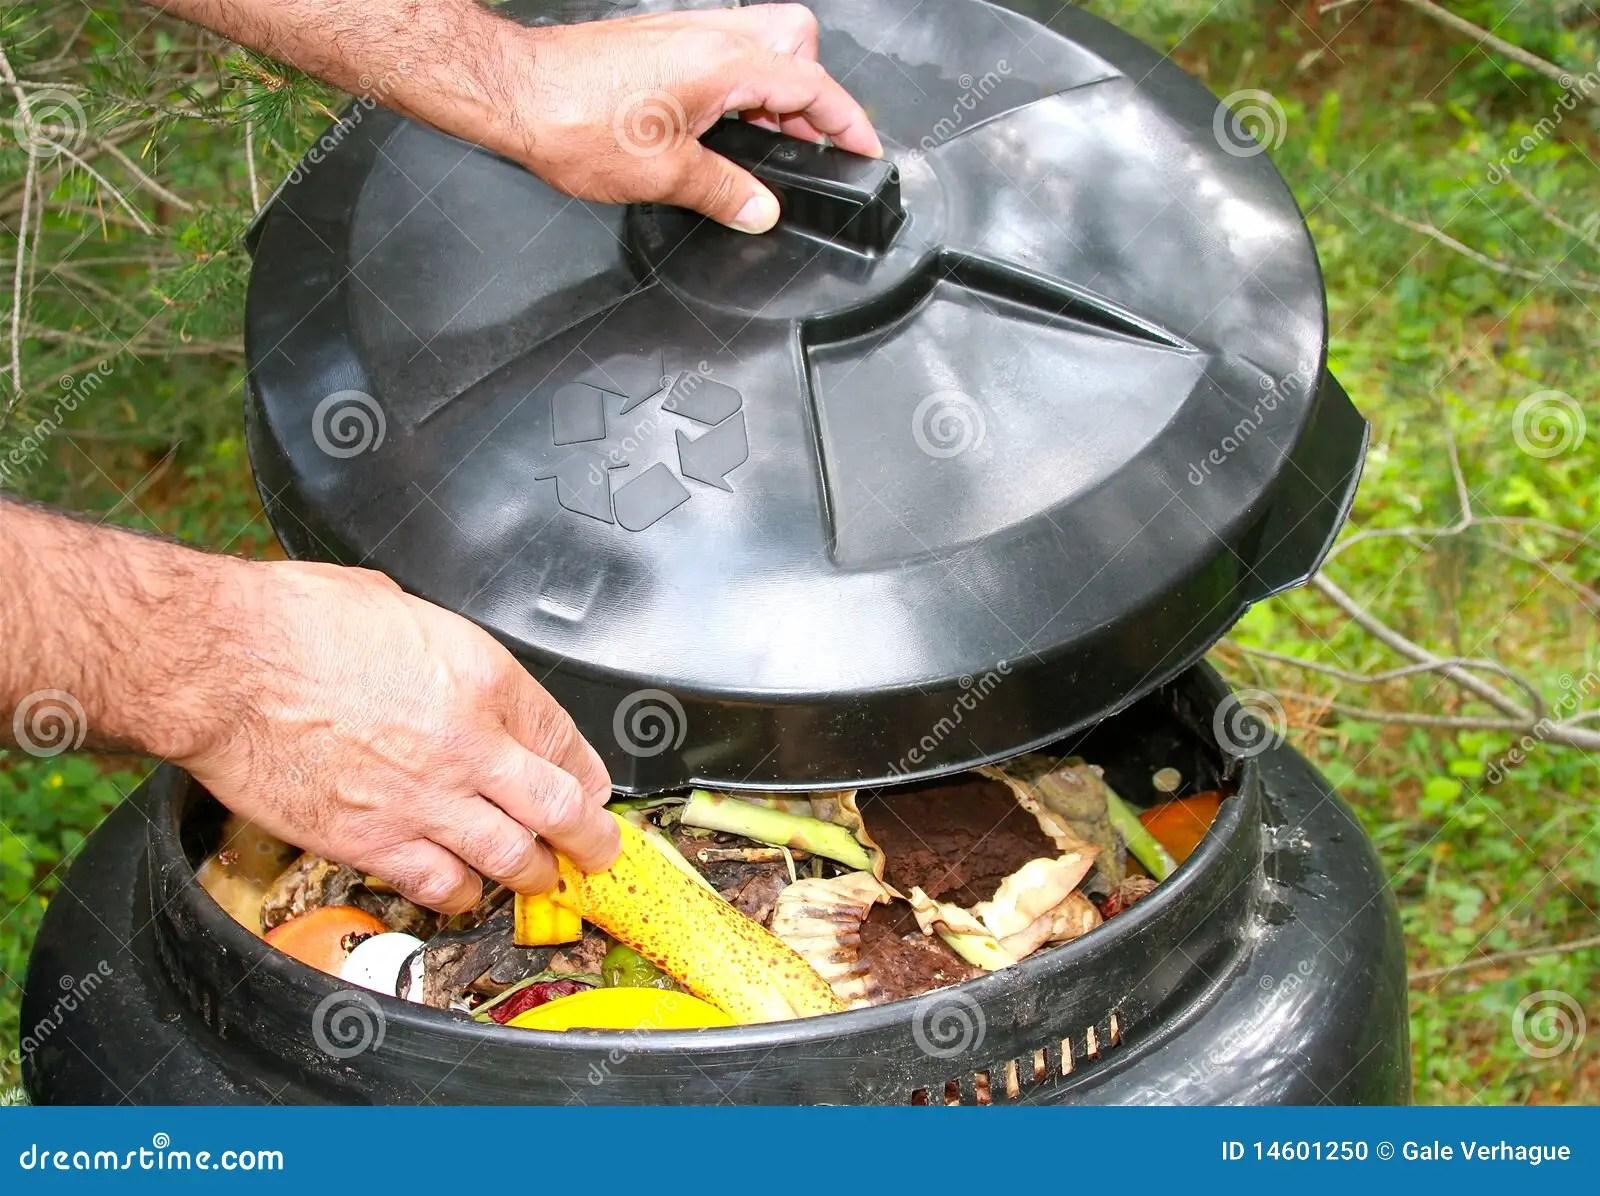 kitchen compost container table light fixtures 框天然肥料库存照片 图片包括有管理 堆肥 庭院 农夫 厨房 天然肥料 堆肥容器转换肥料庭院有机对使用的浪费